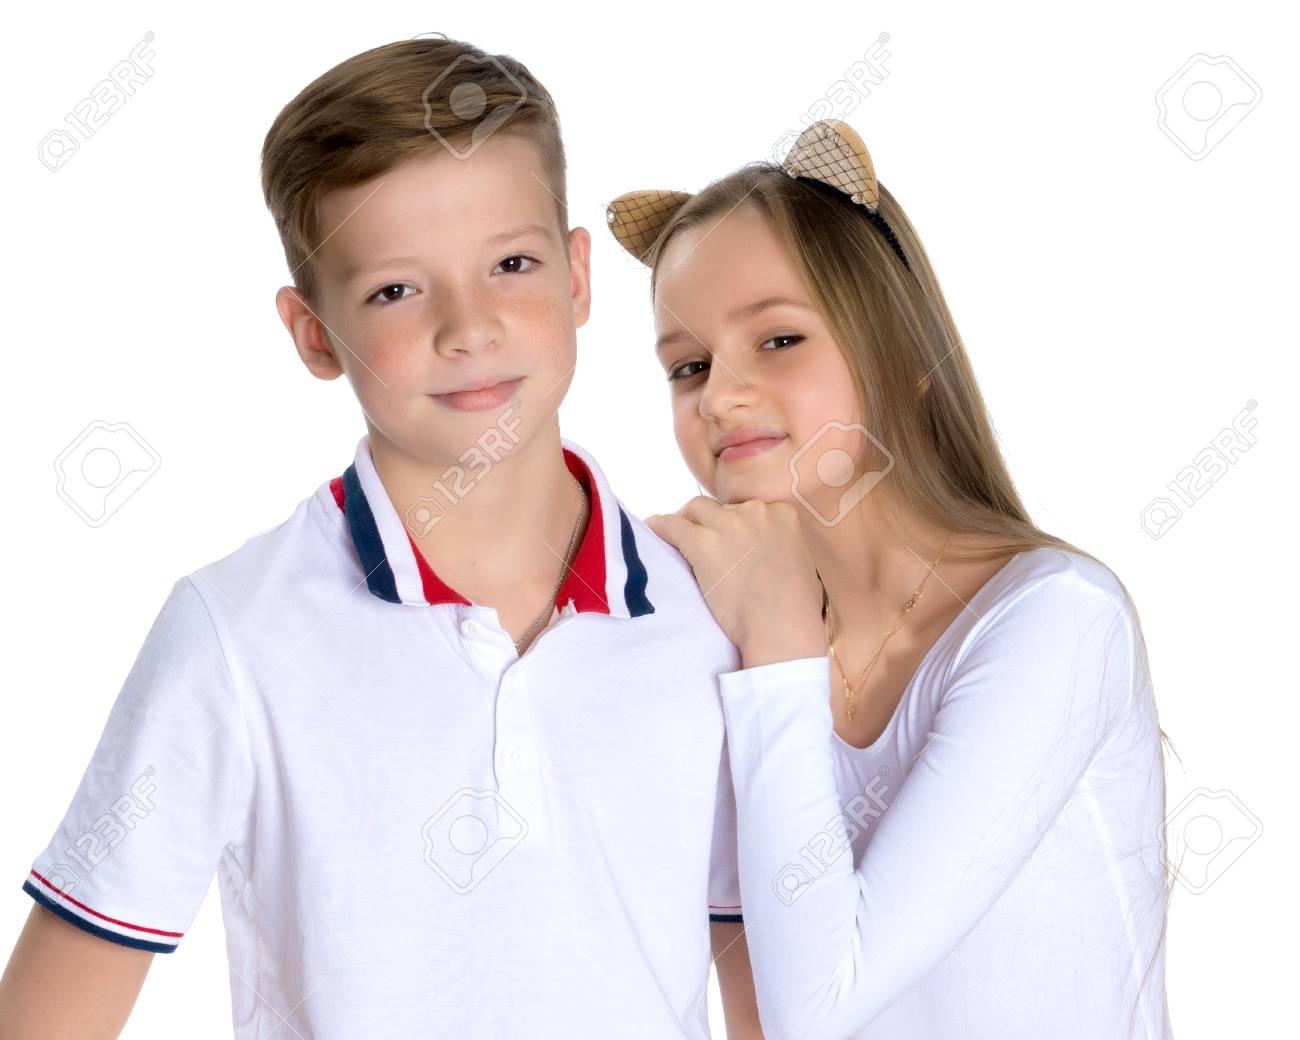 Sister brother teens pics